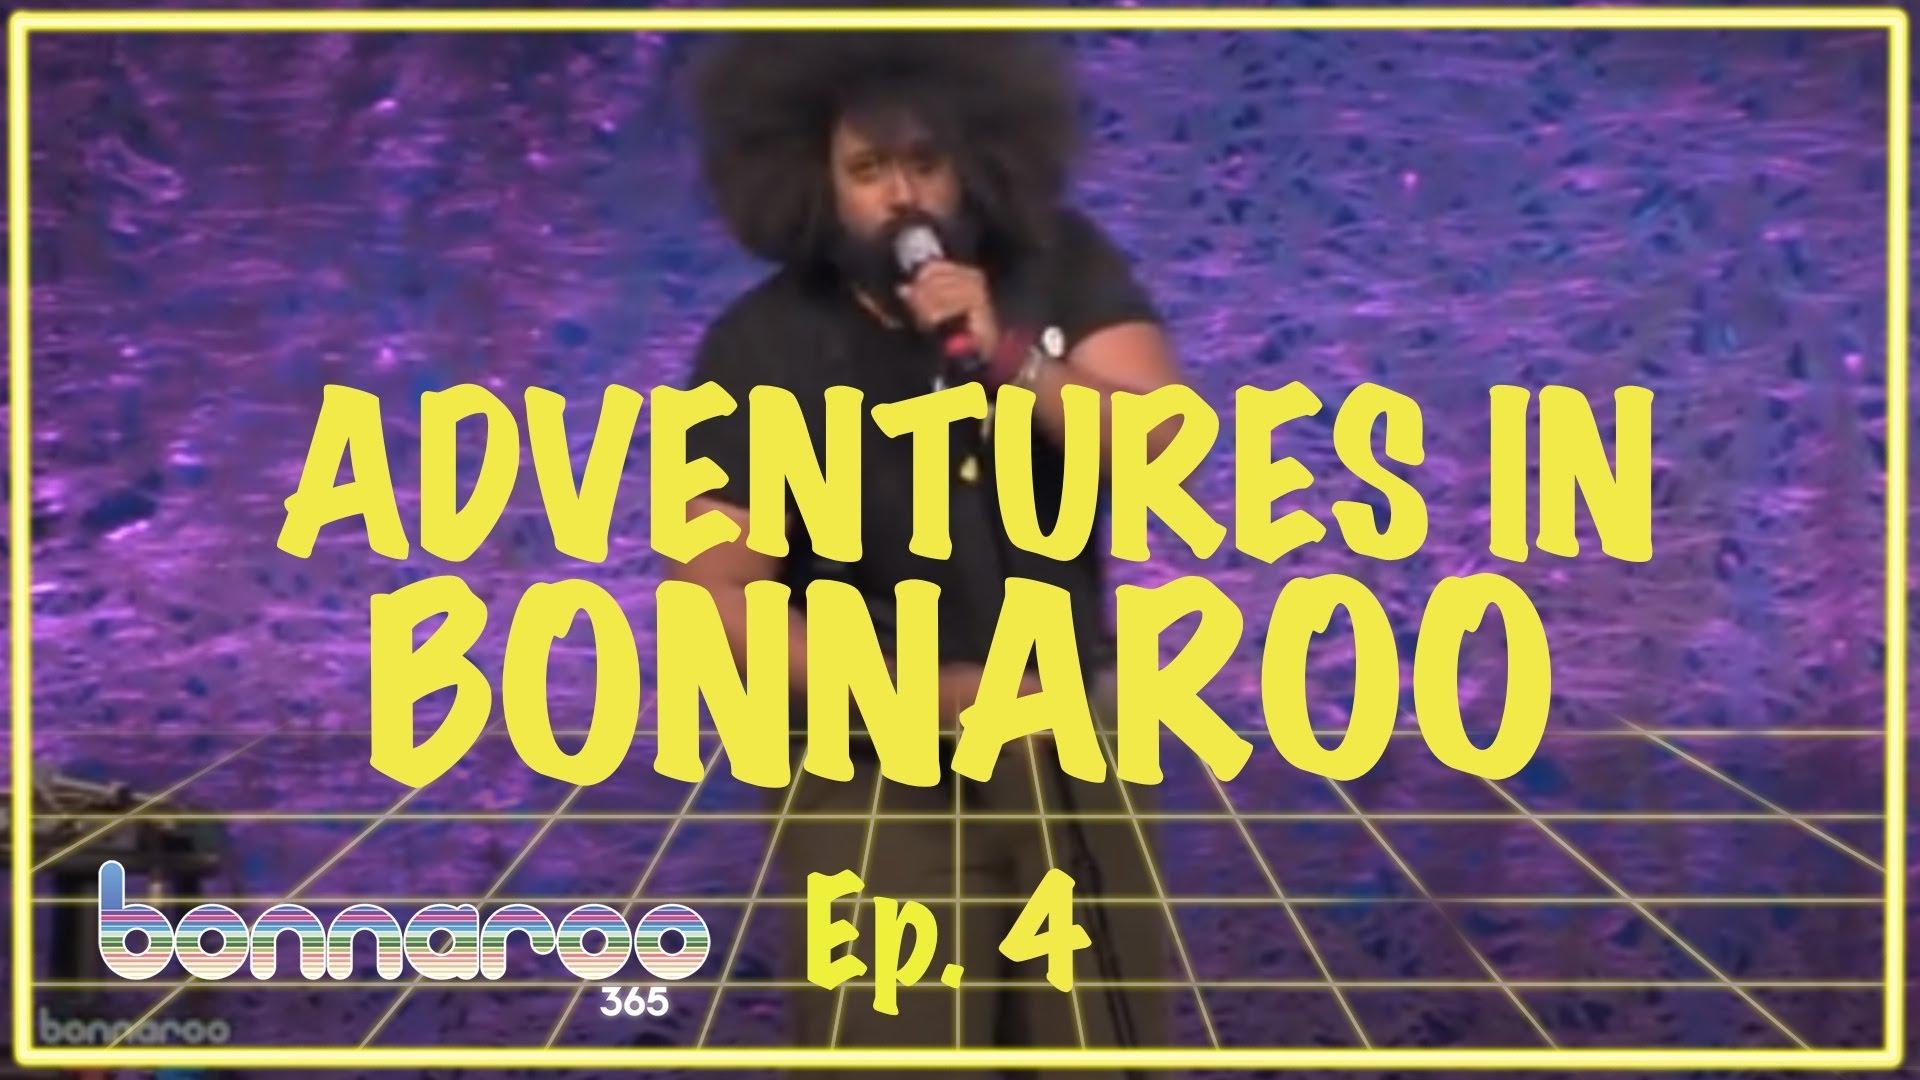 Bonnaroo's comedy lineup features Chris Hardwick, Reggie Watts & more